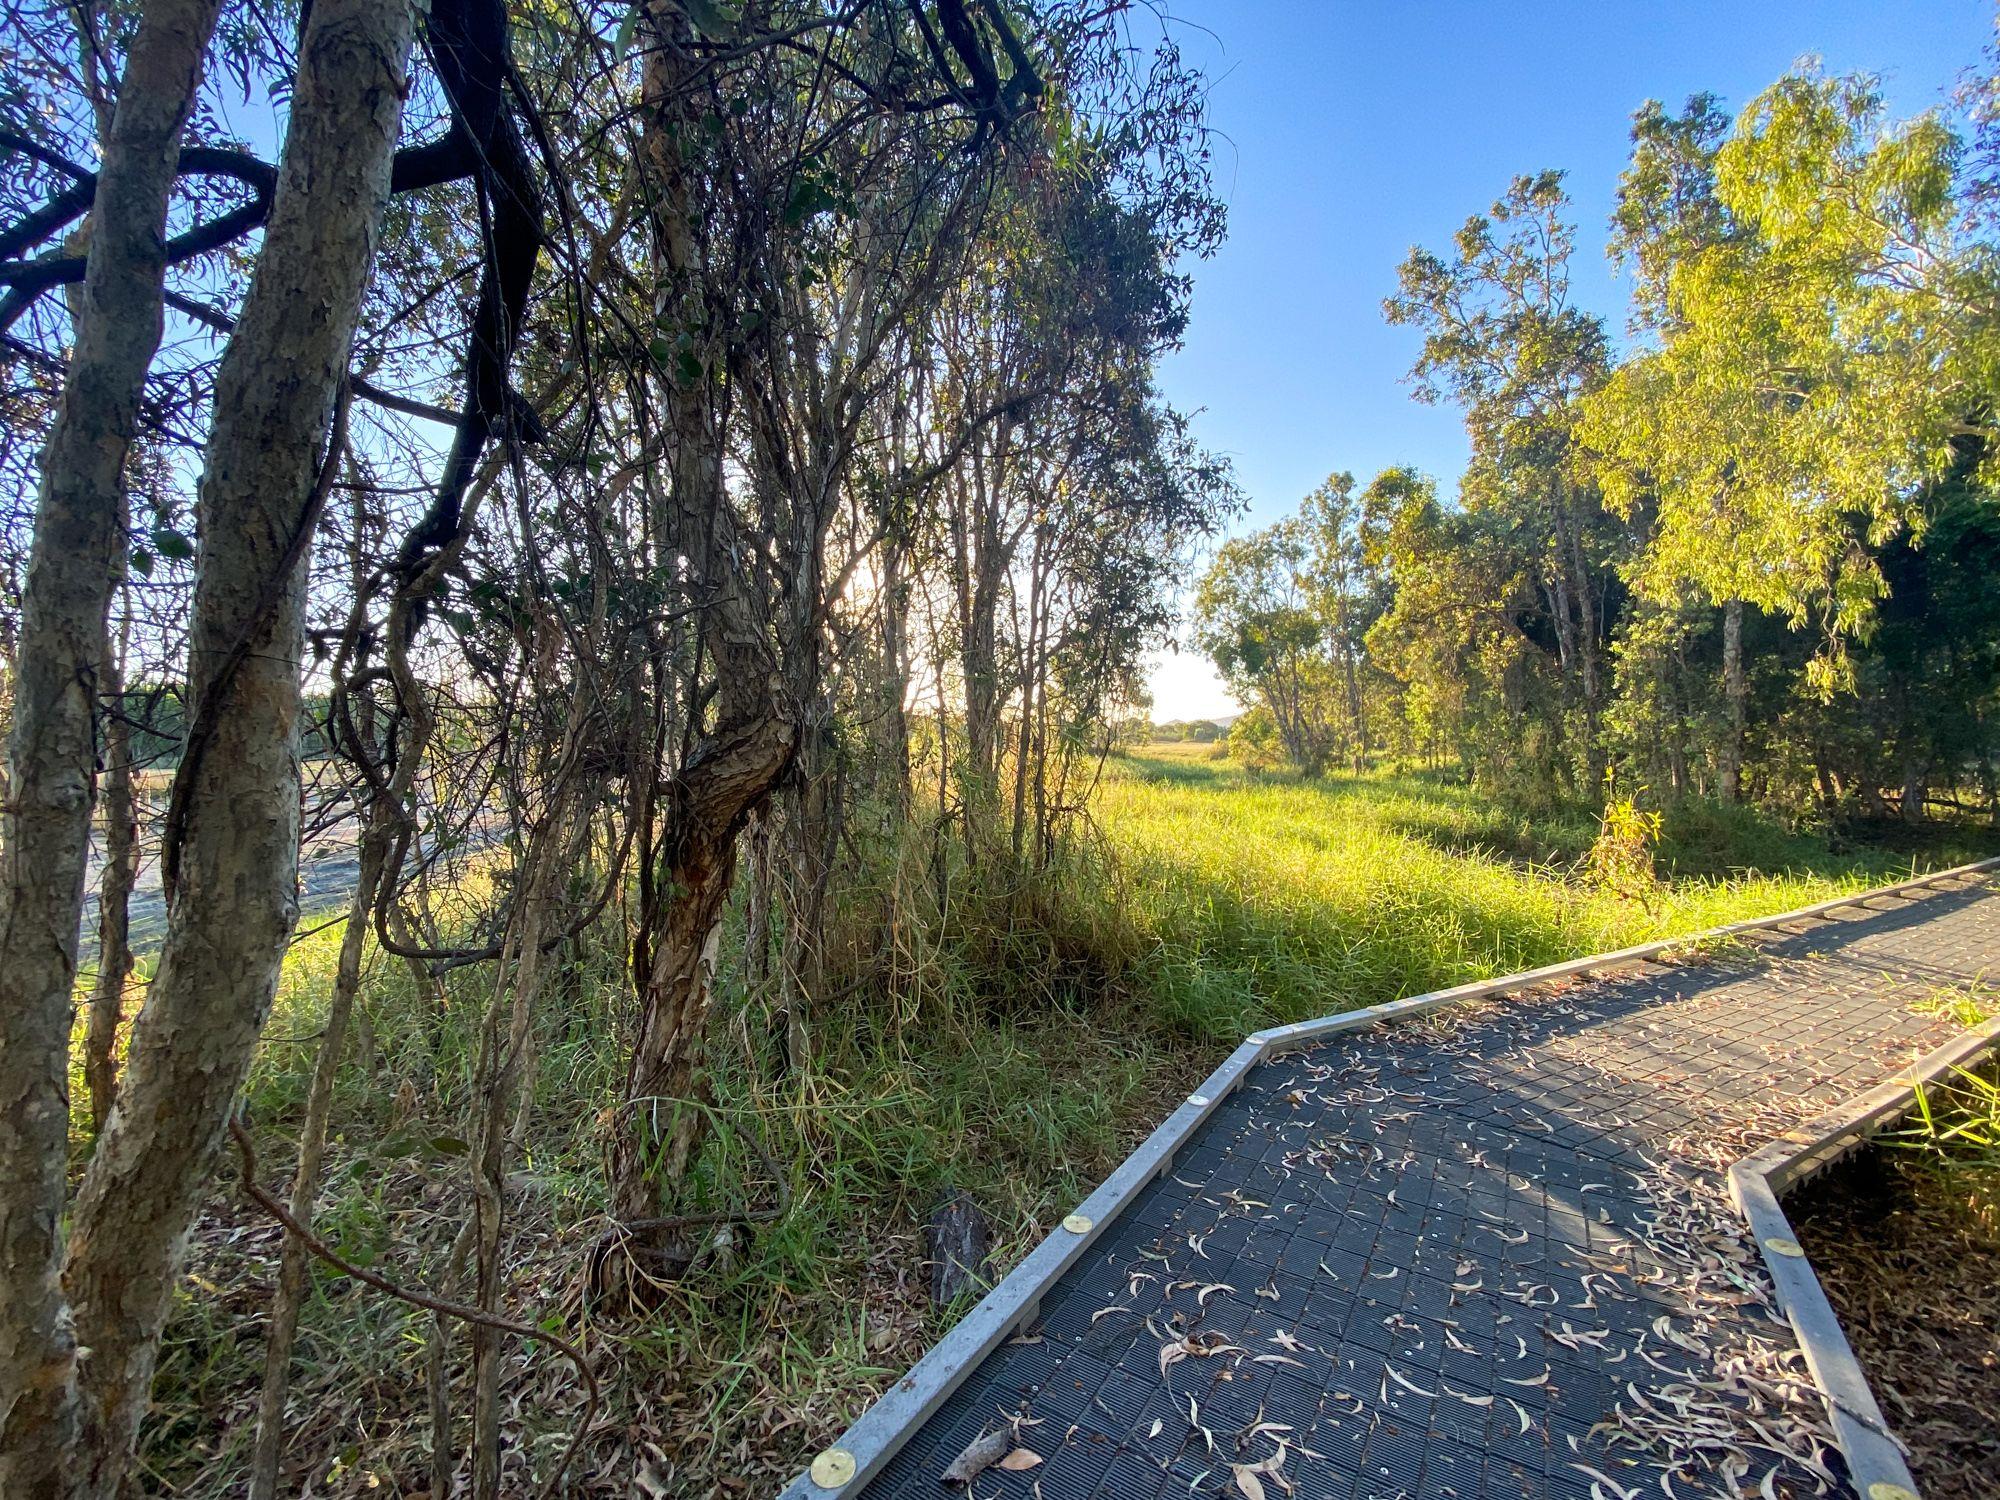 rowes bay wetlands boardwalk path